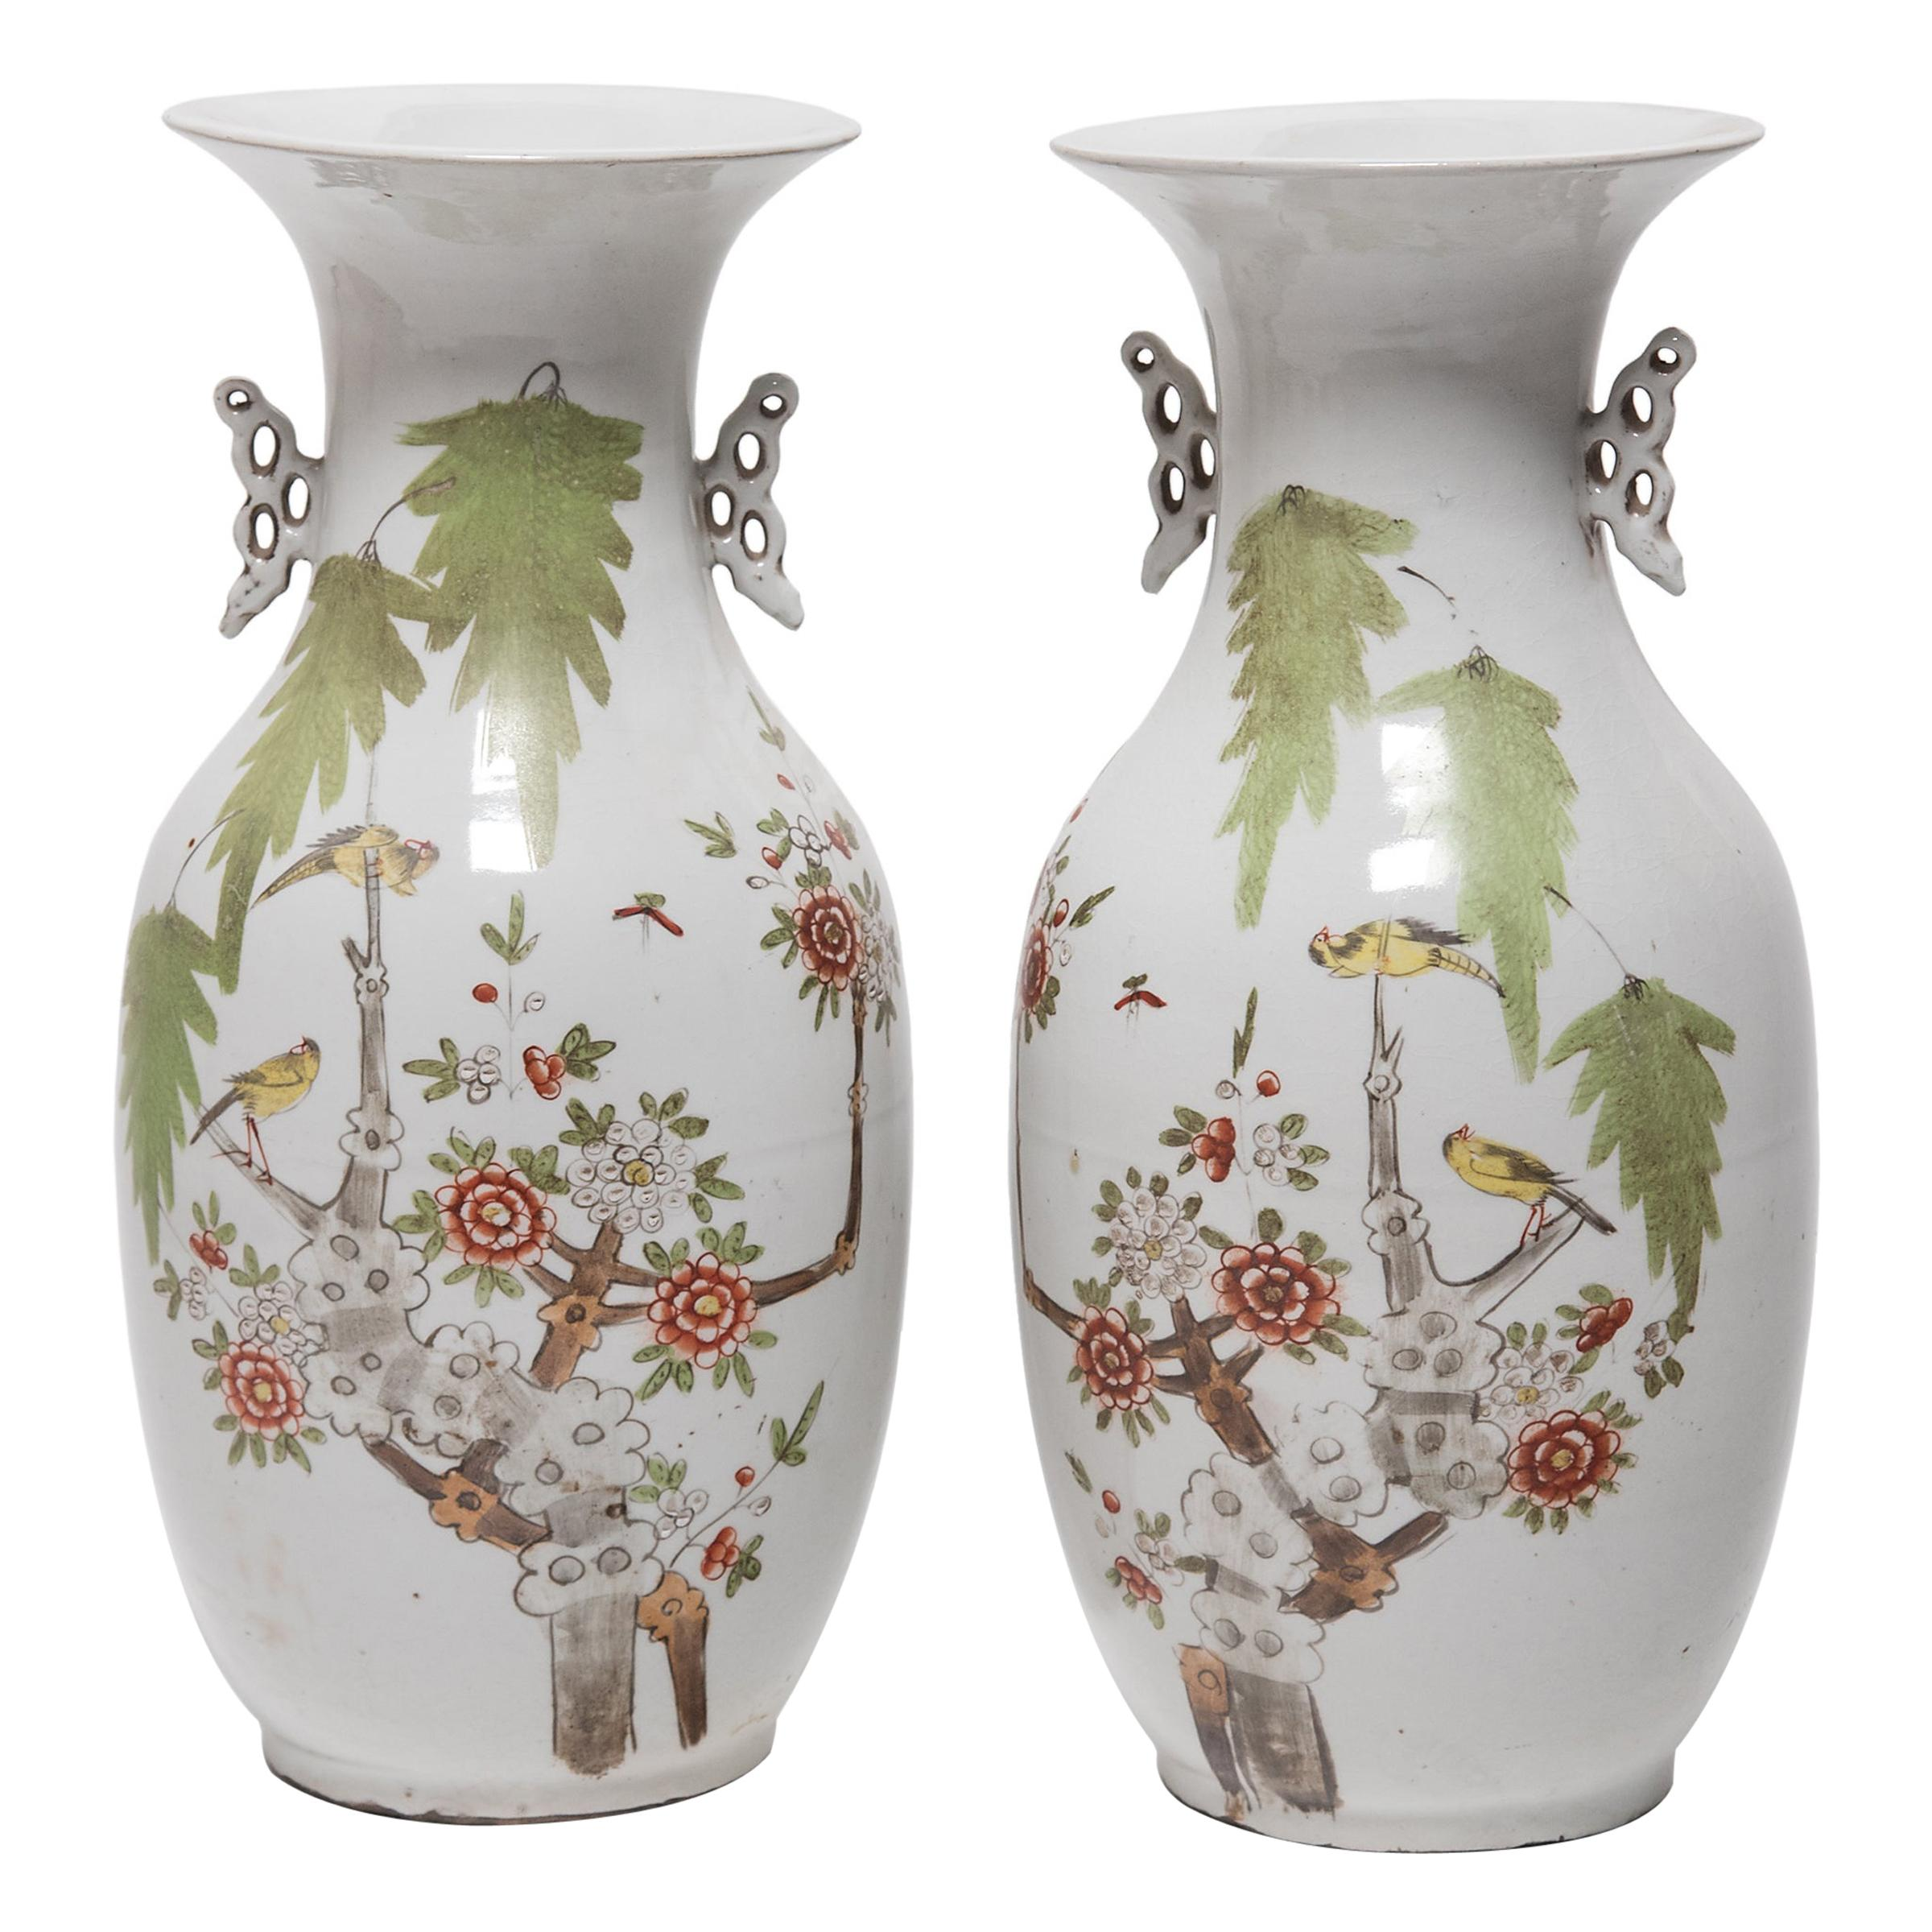 Pair of Chinese Springtime Vases, circa 1900